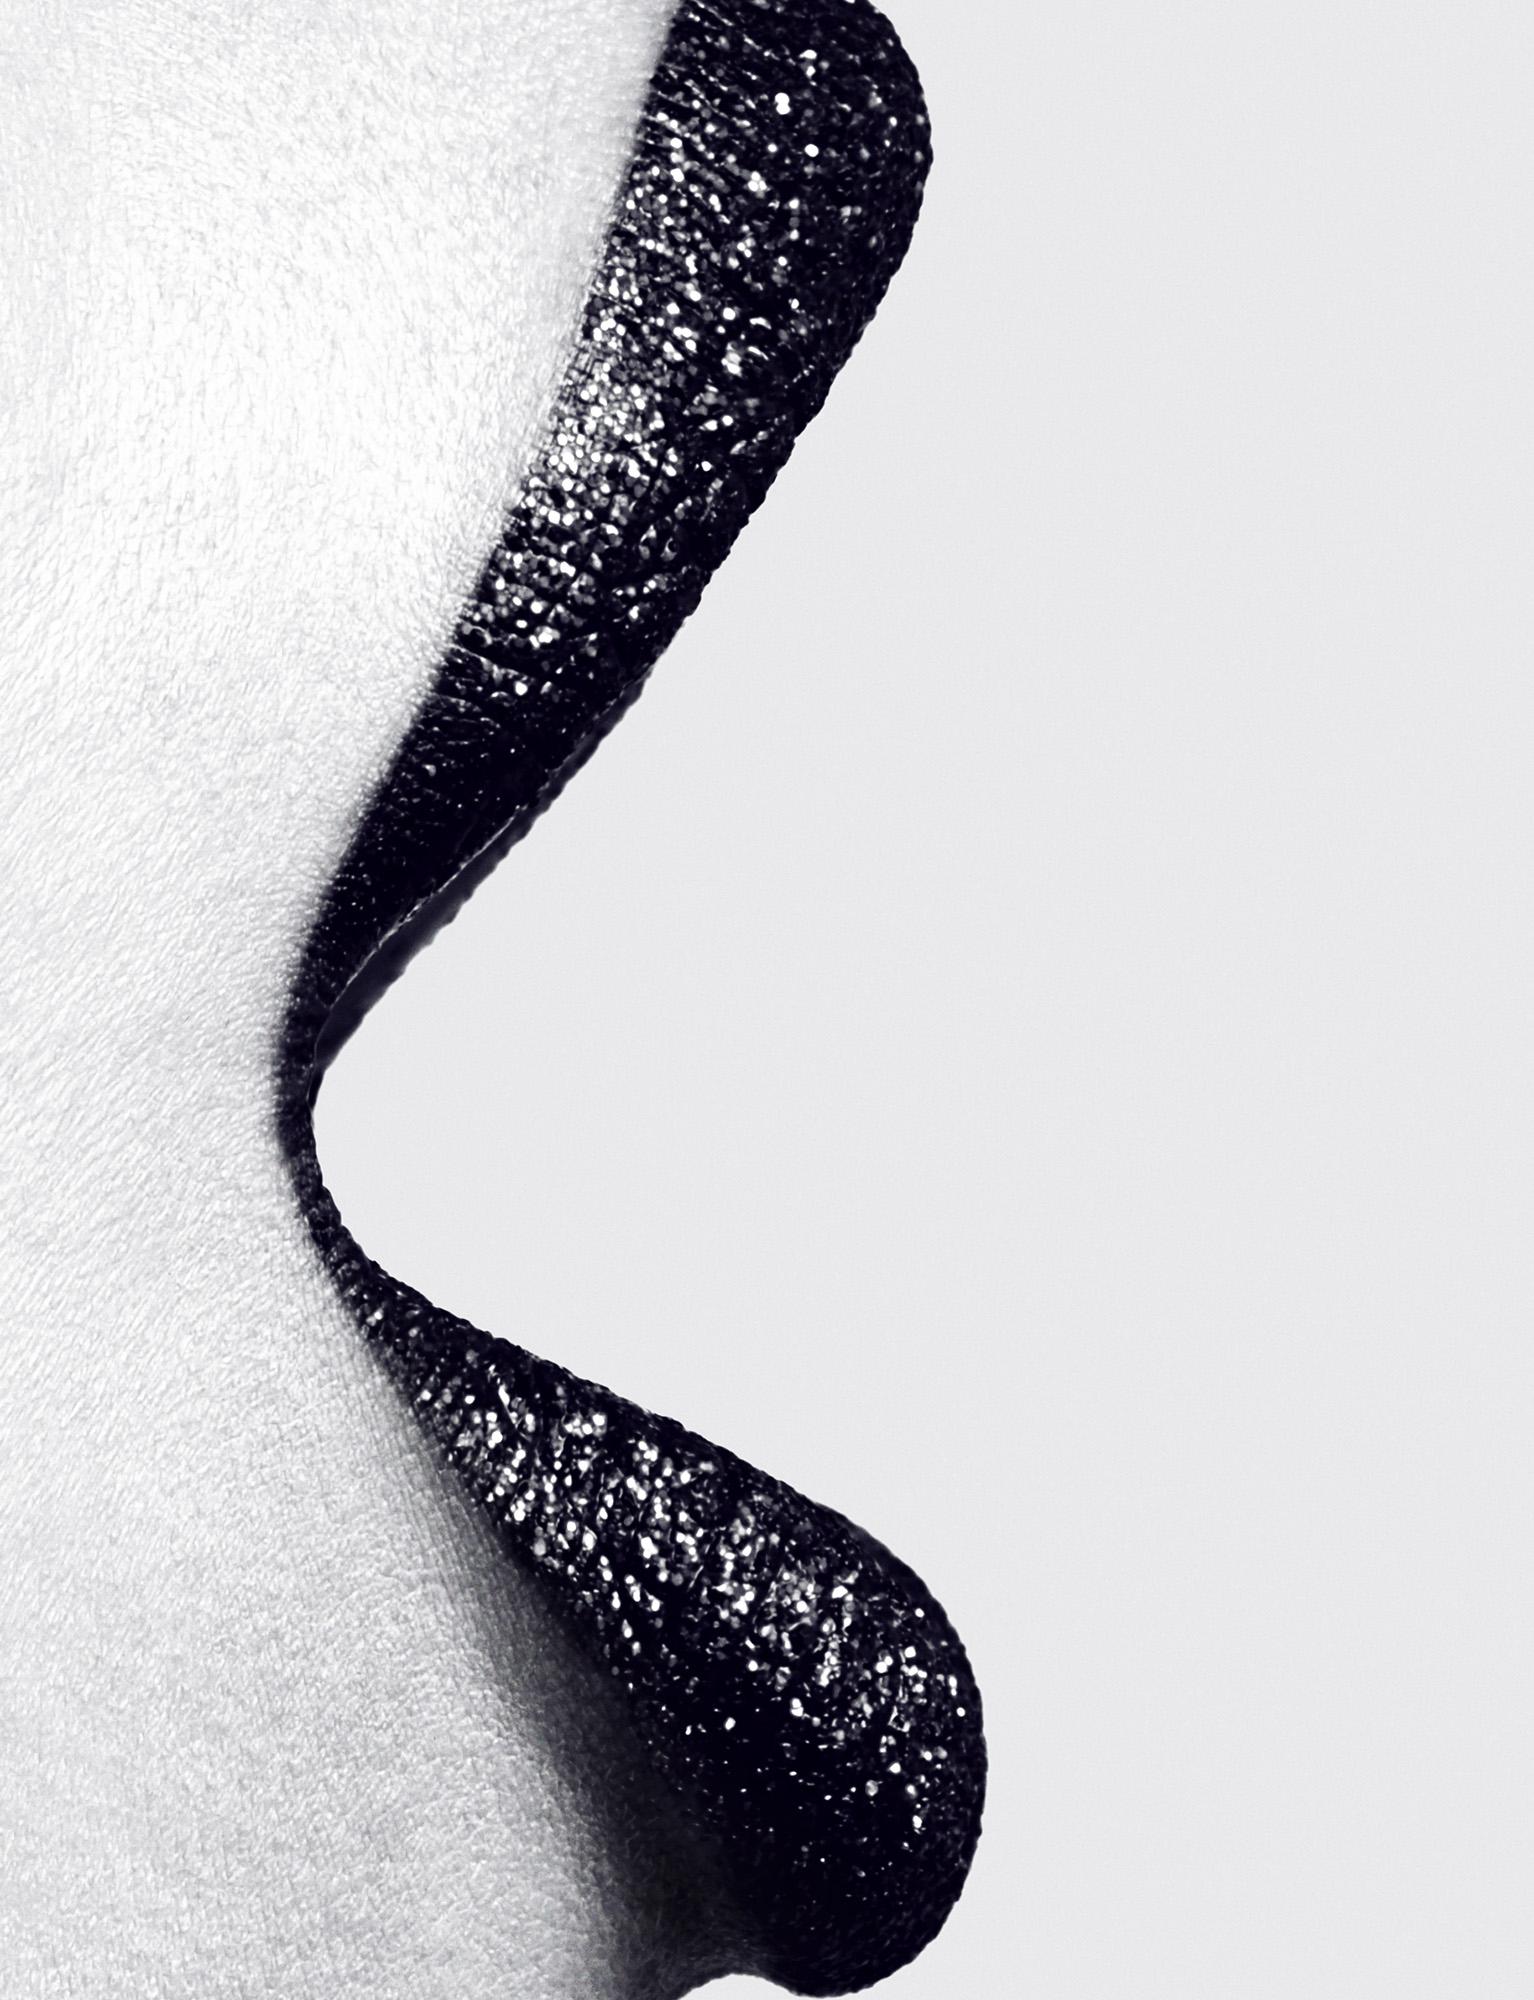 Miguel Riveriego - Ashley Graham image